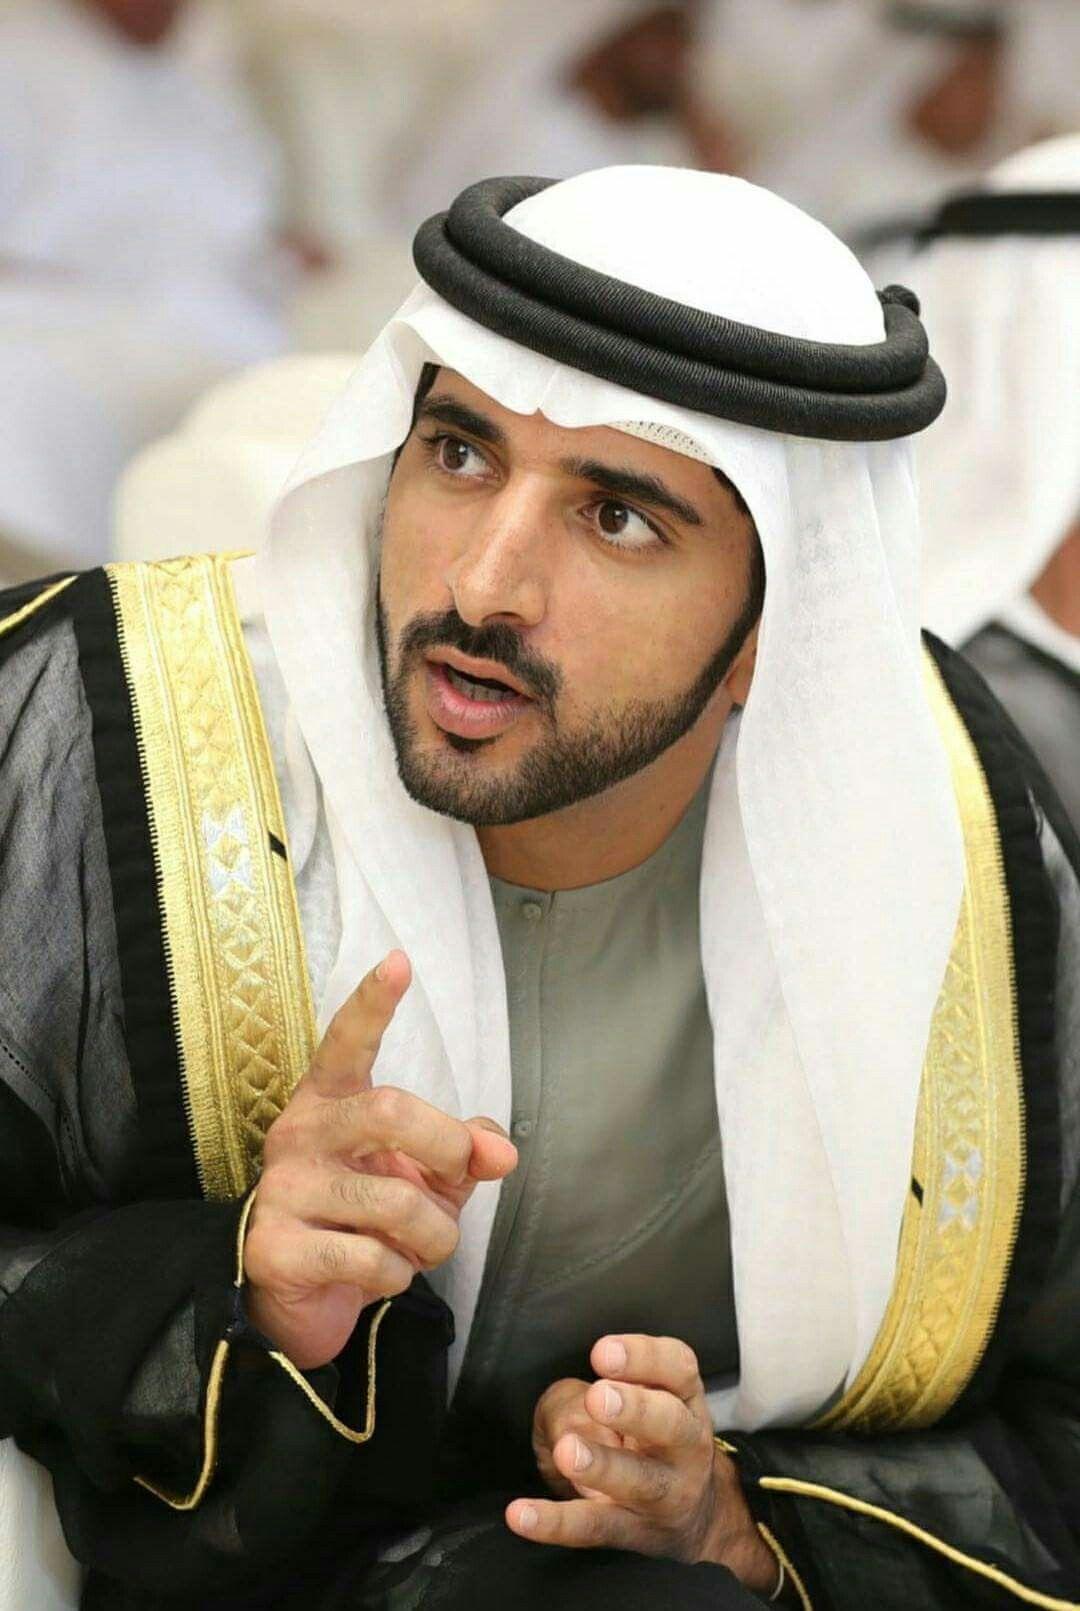 Sheikh Hamdan Wife Photos : sheikh, hamdan, photos, Crown, Prince, Dubai, Sheikh, Hamdan, Mohammed, Rashid, Maktoum, Fazza, 🇦🇪, Handsome, Prince,